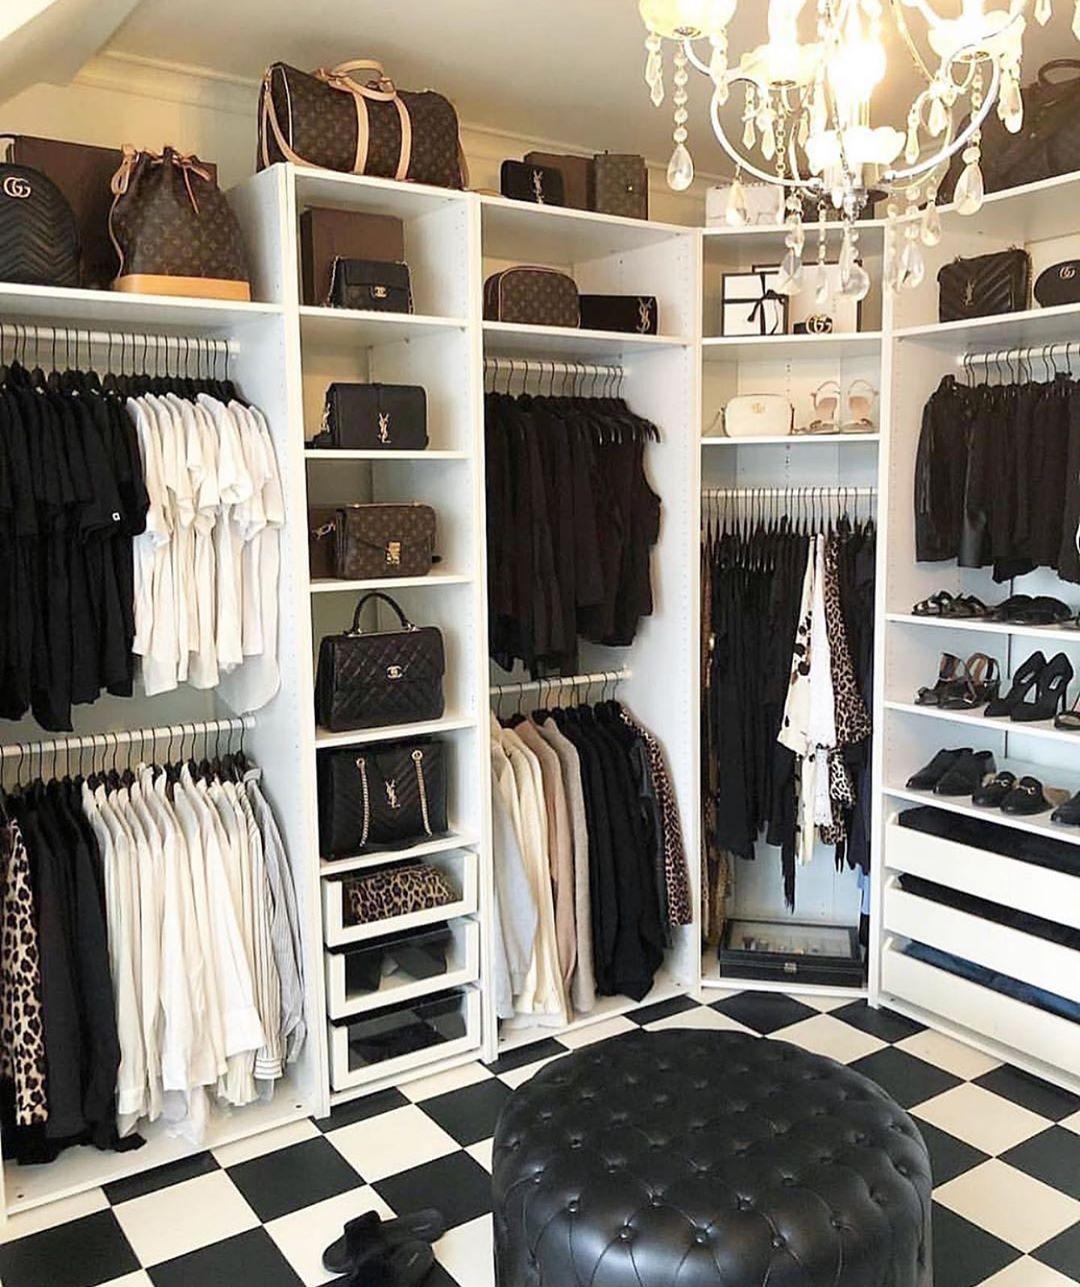 "Gossip Room on Instagram: ""Un dressing de rêve vous ne trouvez pas ? � �: @toneostensen #closet #dressing #goals #heaven #decoration #interiordesign #classy #need…"""